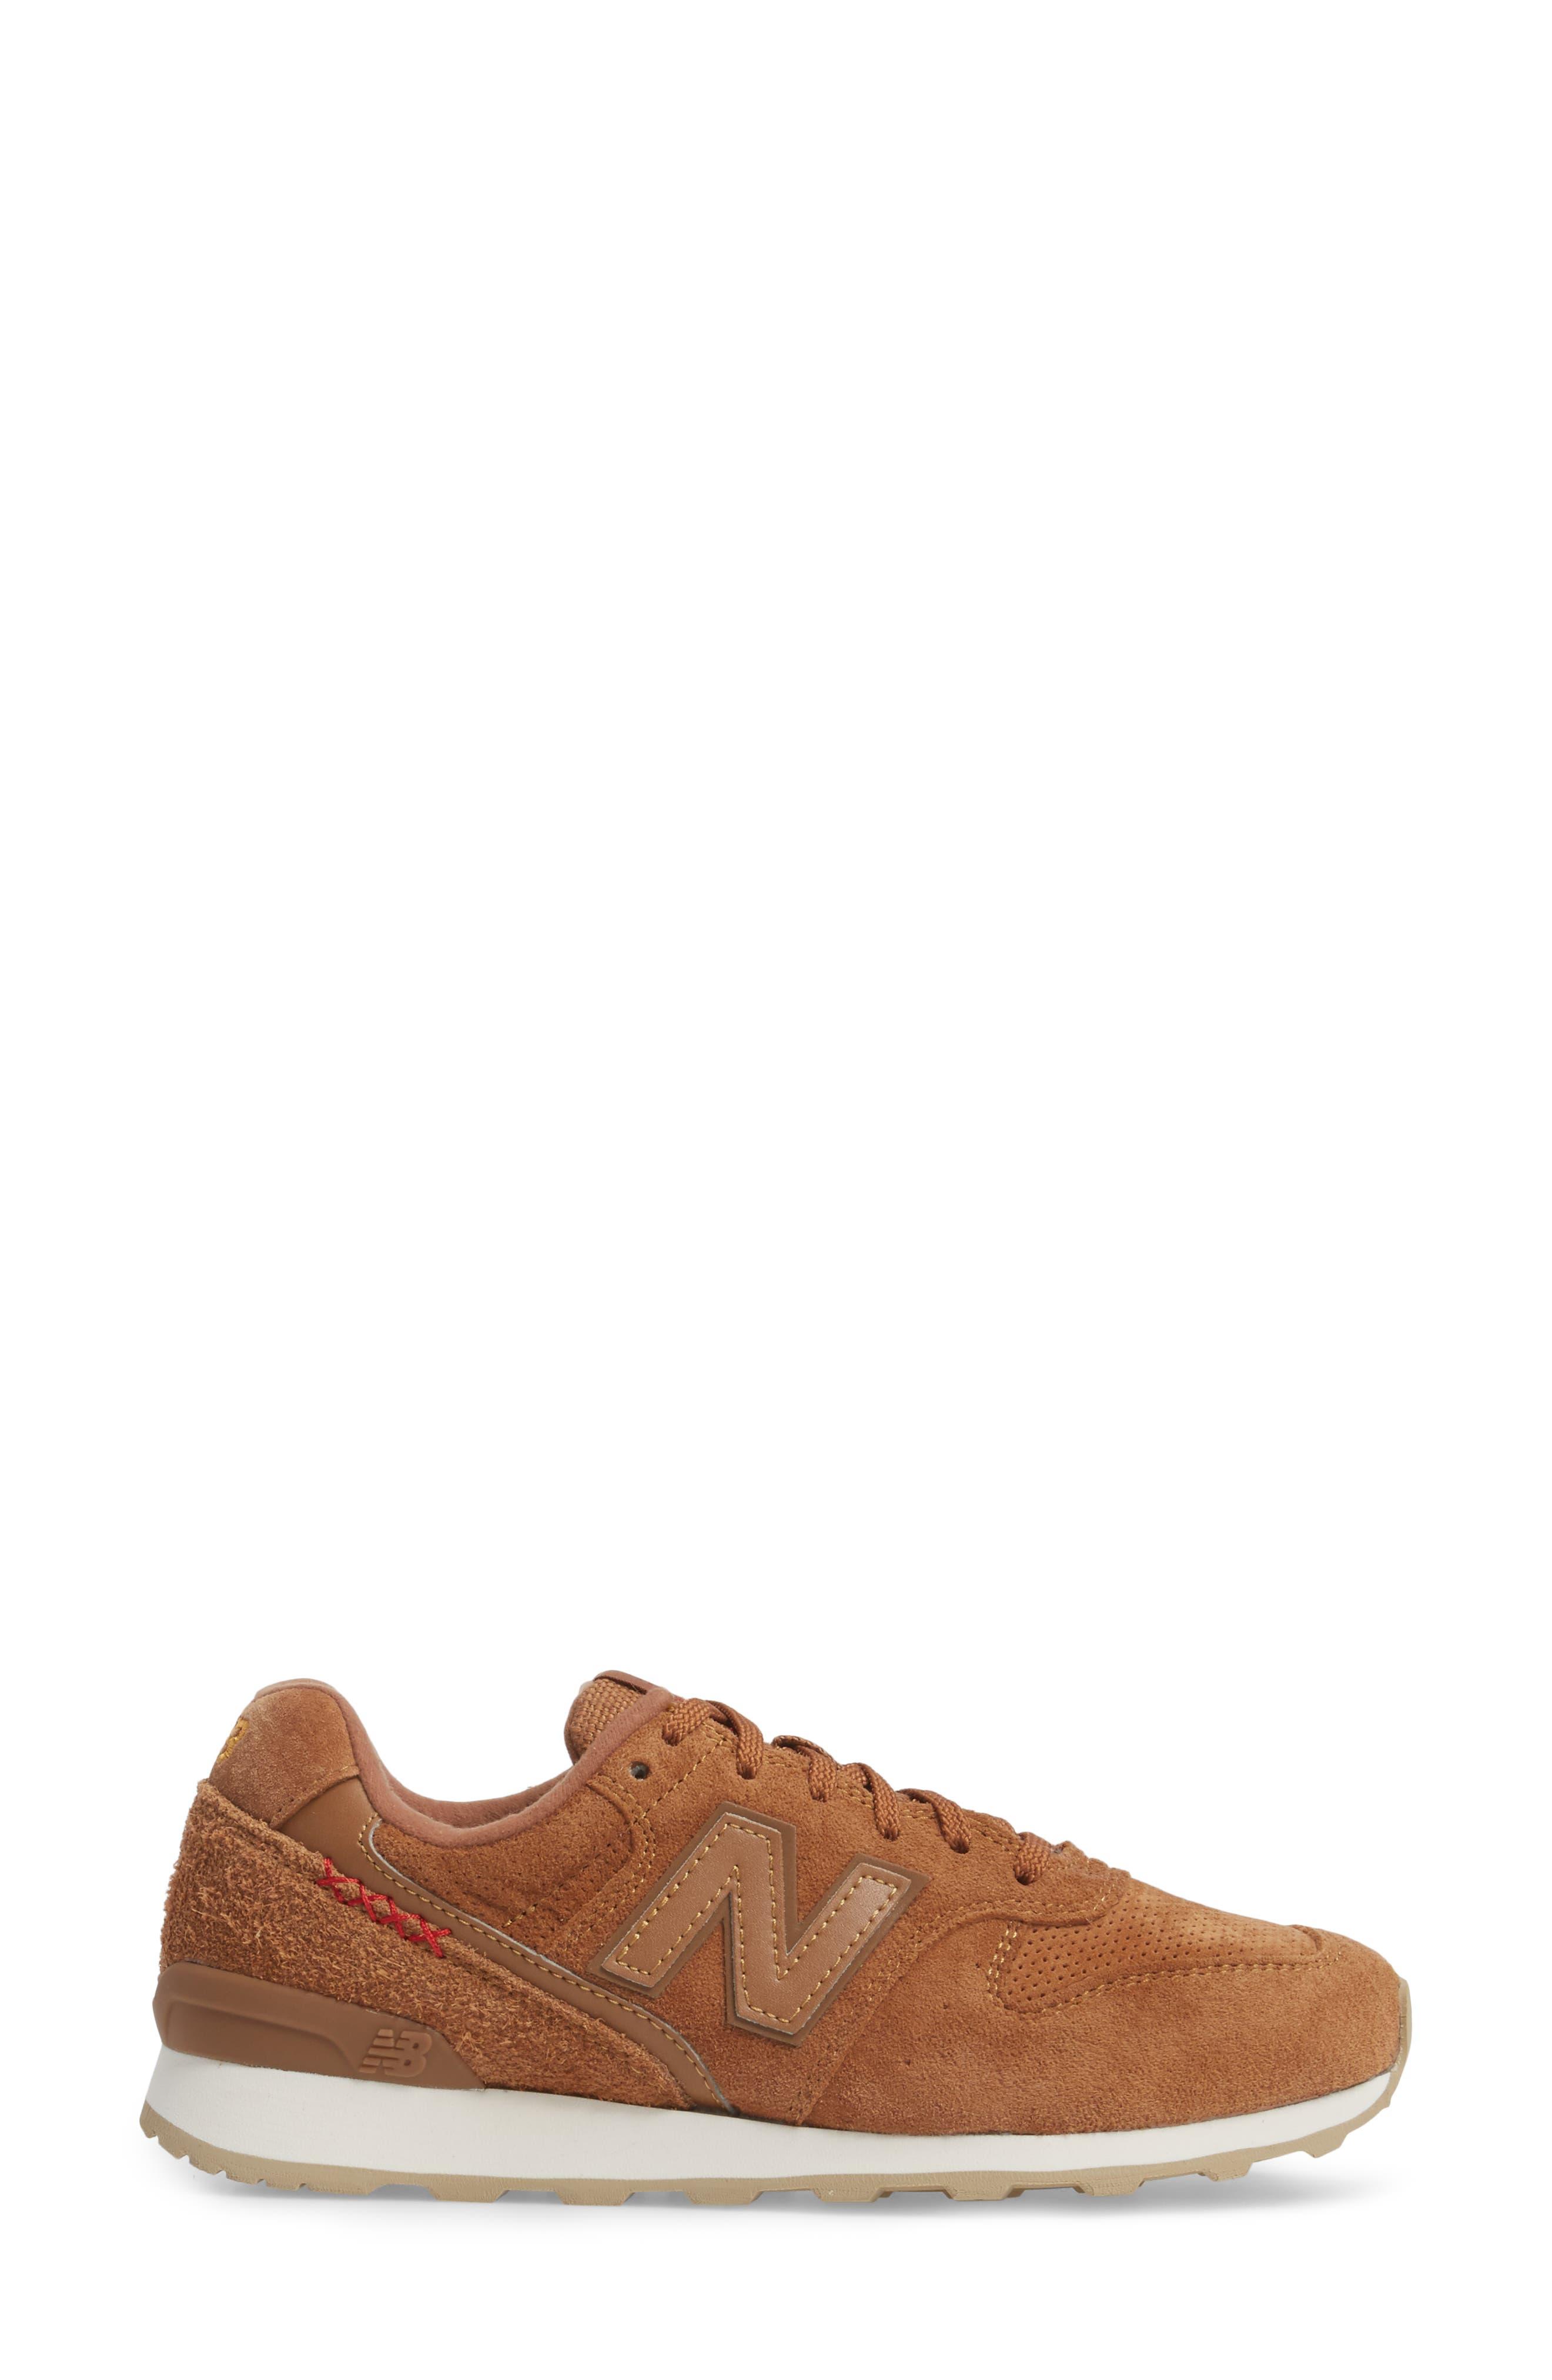 Alternate Image 3  - New Balance 696 Sneaker (Women)